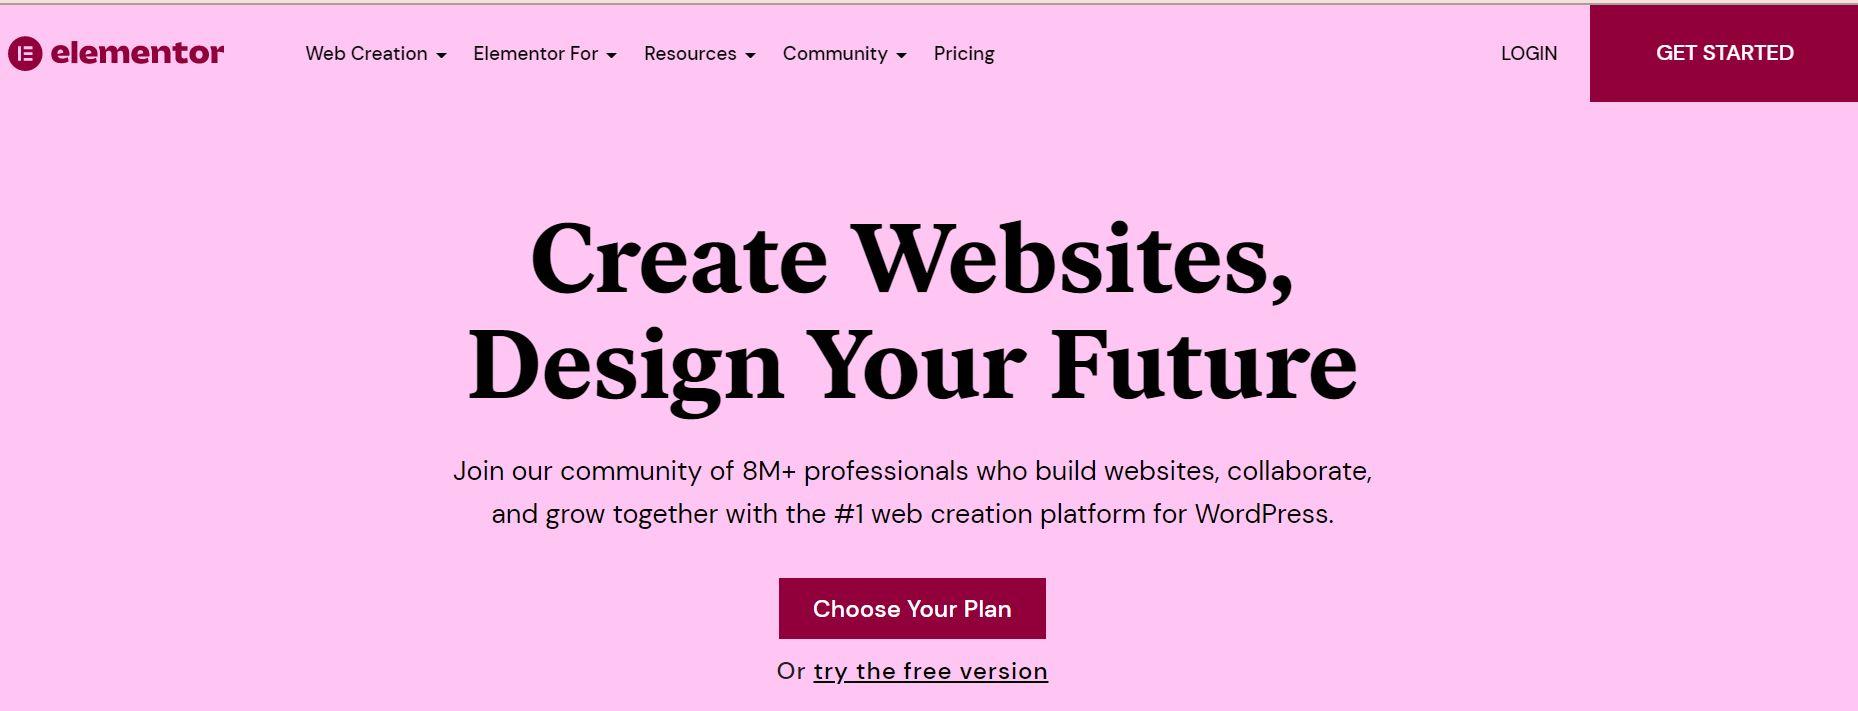 Elementor: Free Website Builder Plugin for WordPress